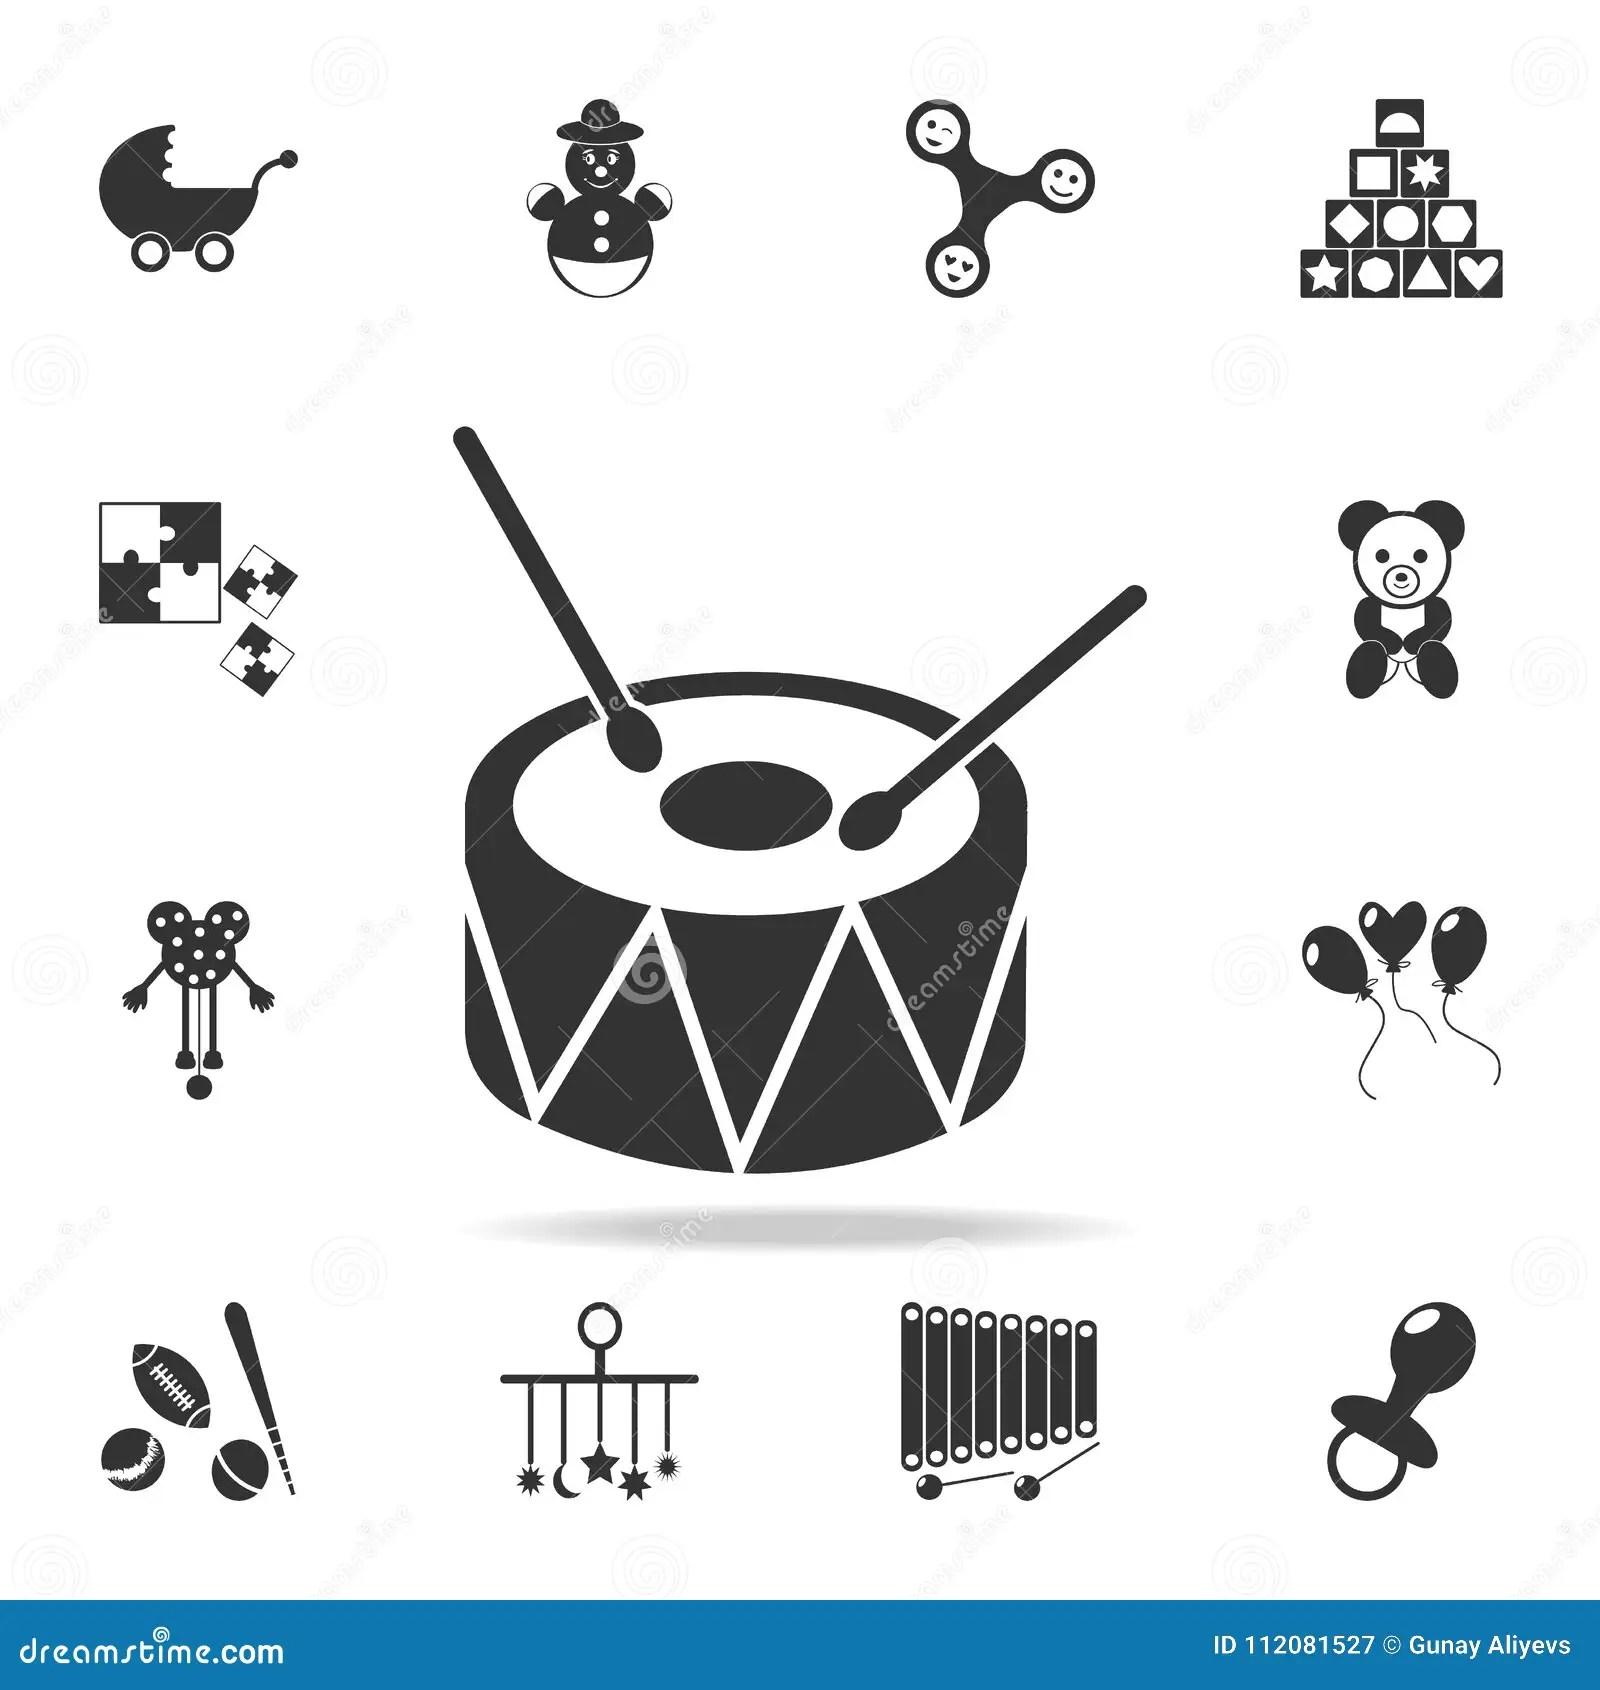 Drum Toy Icon. Detailed Set Of Baby Toys Icons. Premium